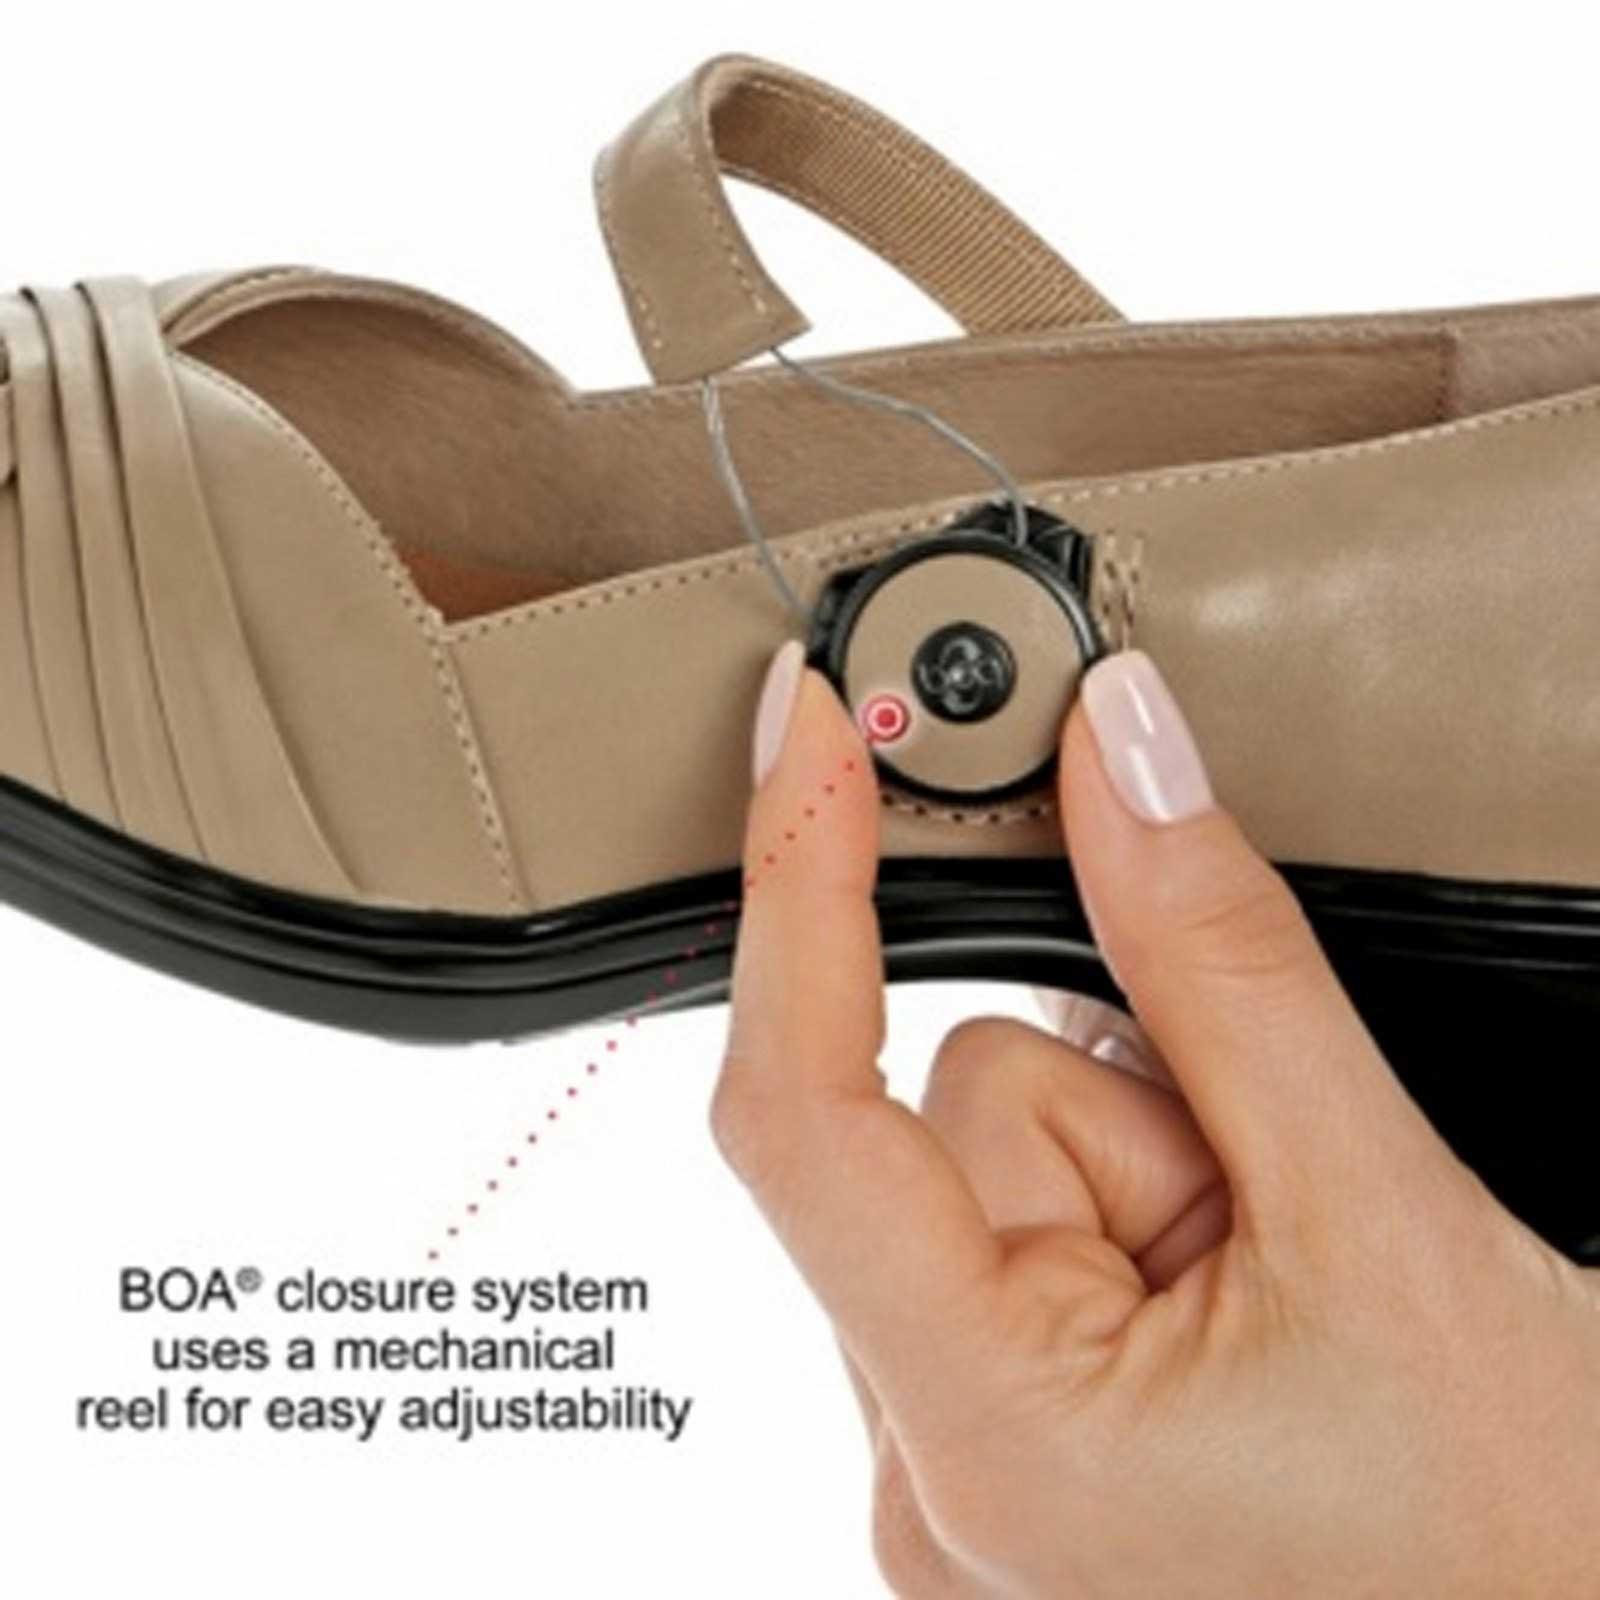 s the australia womens shoes footwear comfort period finest classic quality comforter men dr dress